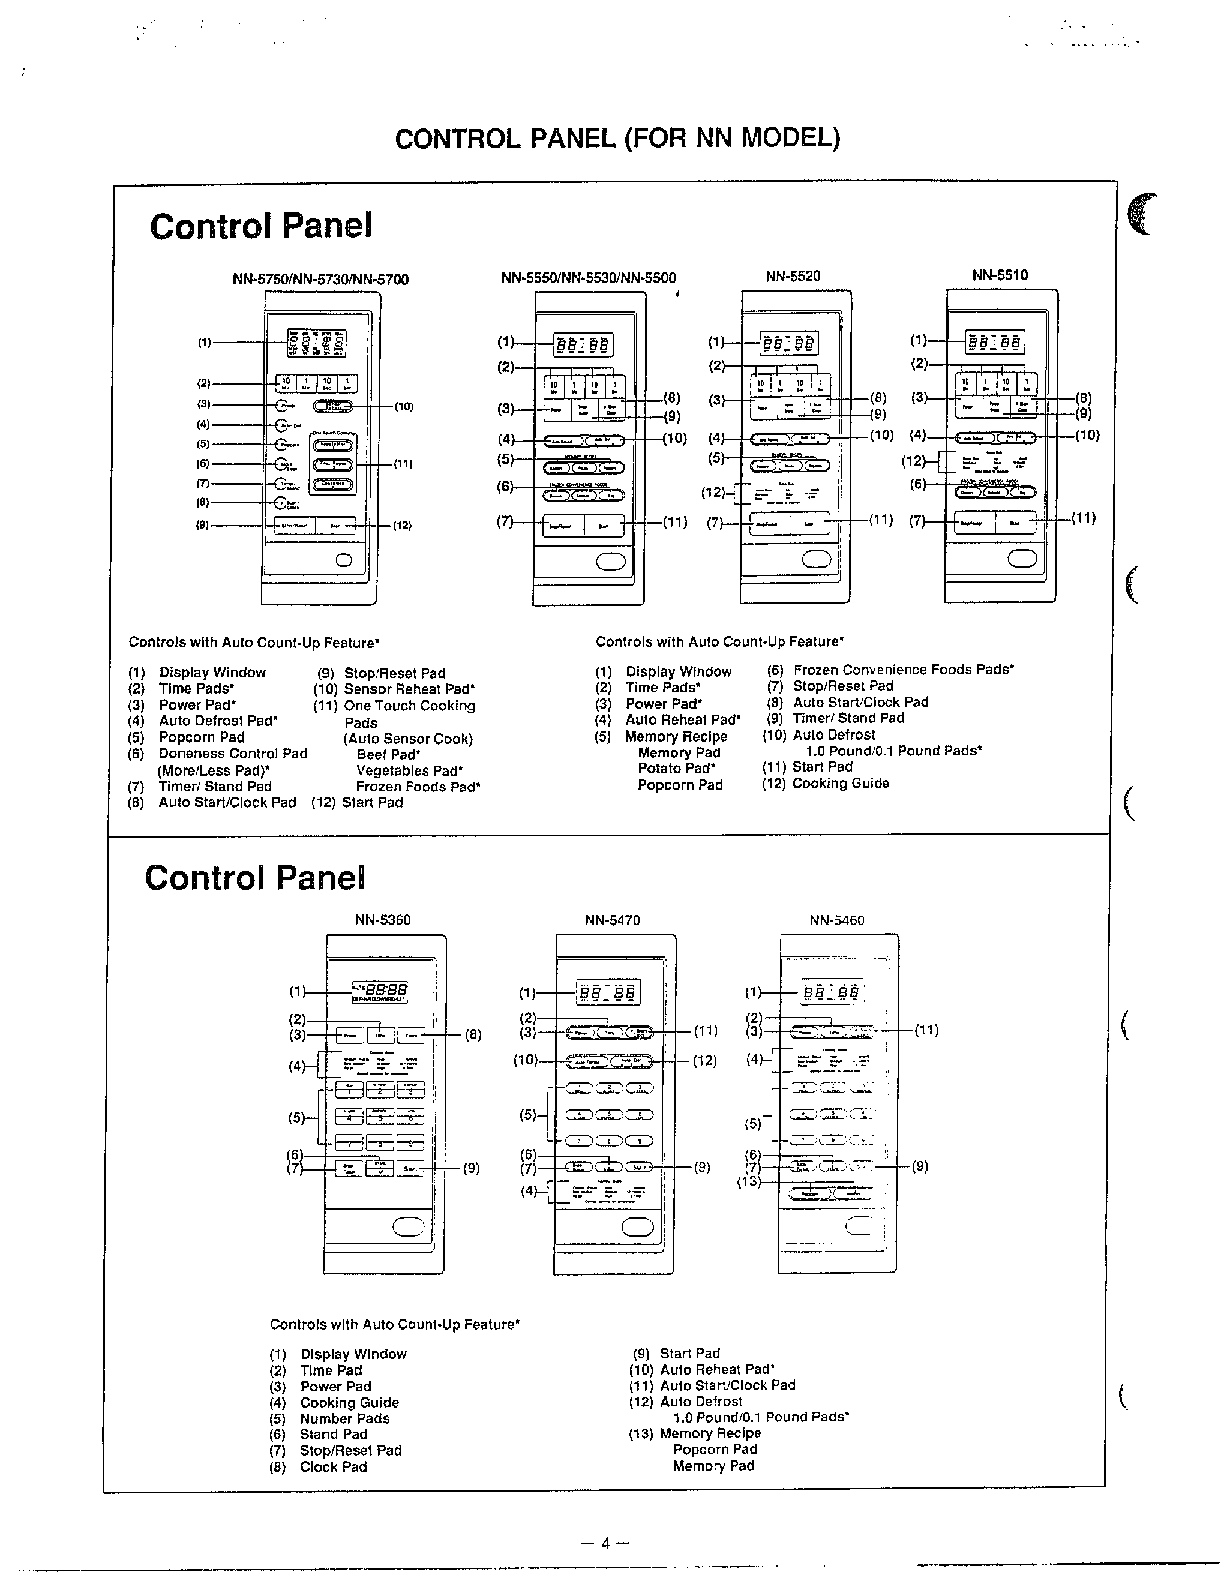 2006 Duramax Engine Diagram | Wiring Library